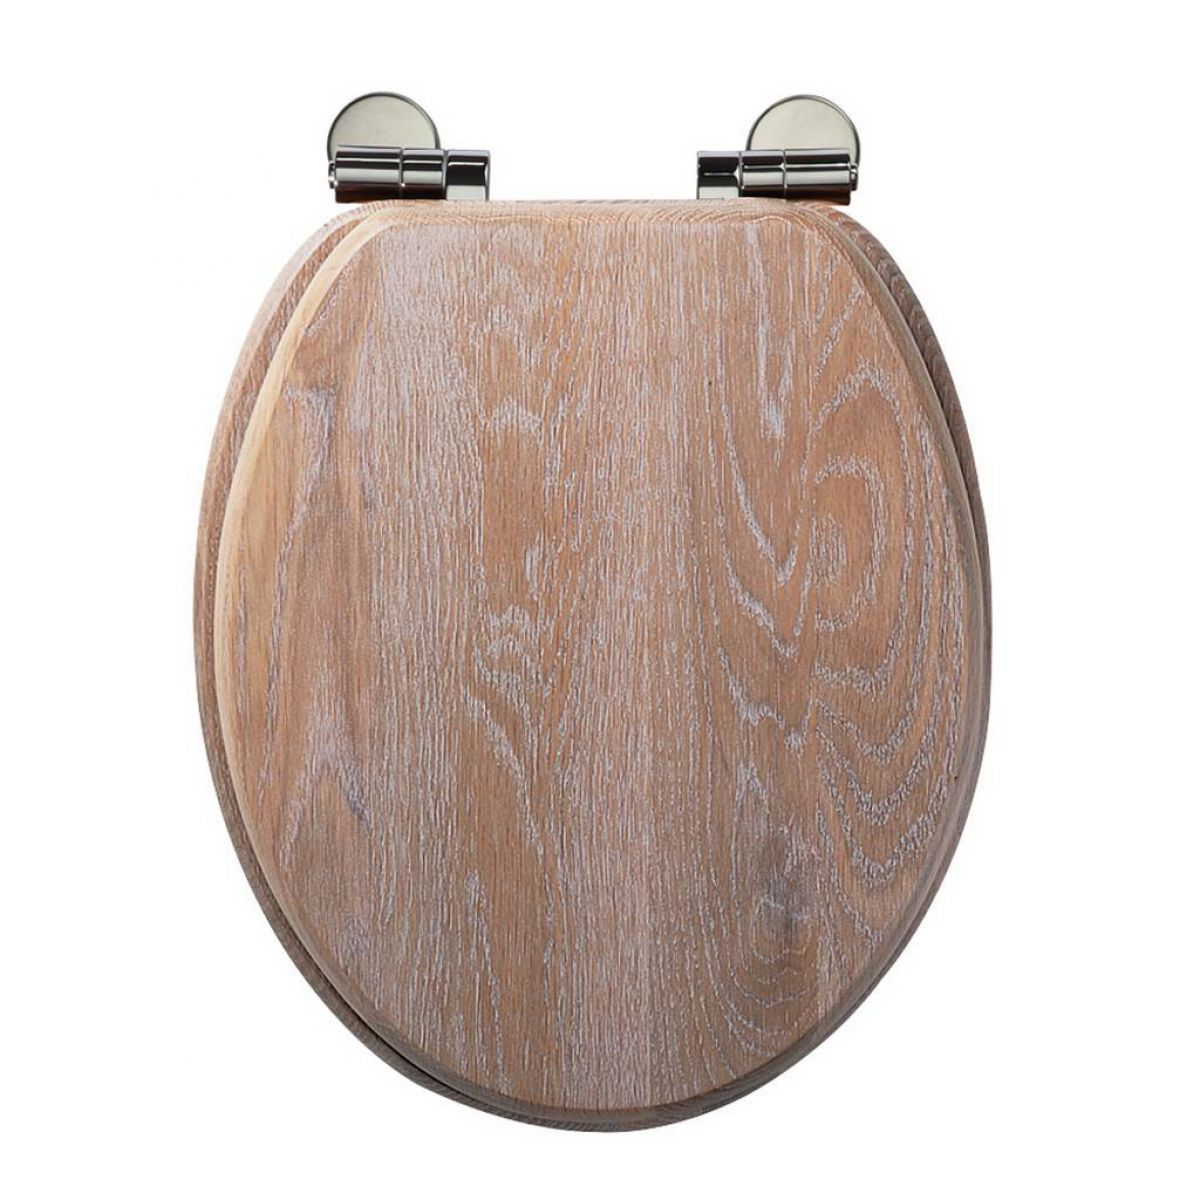 roper rhodes traditional soft close toilet seat uk bathrooms. Black Bedroom Furniture Sets. Home Design Ideas